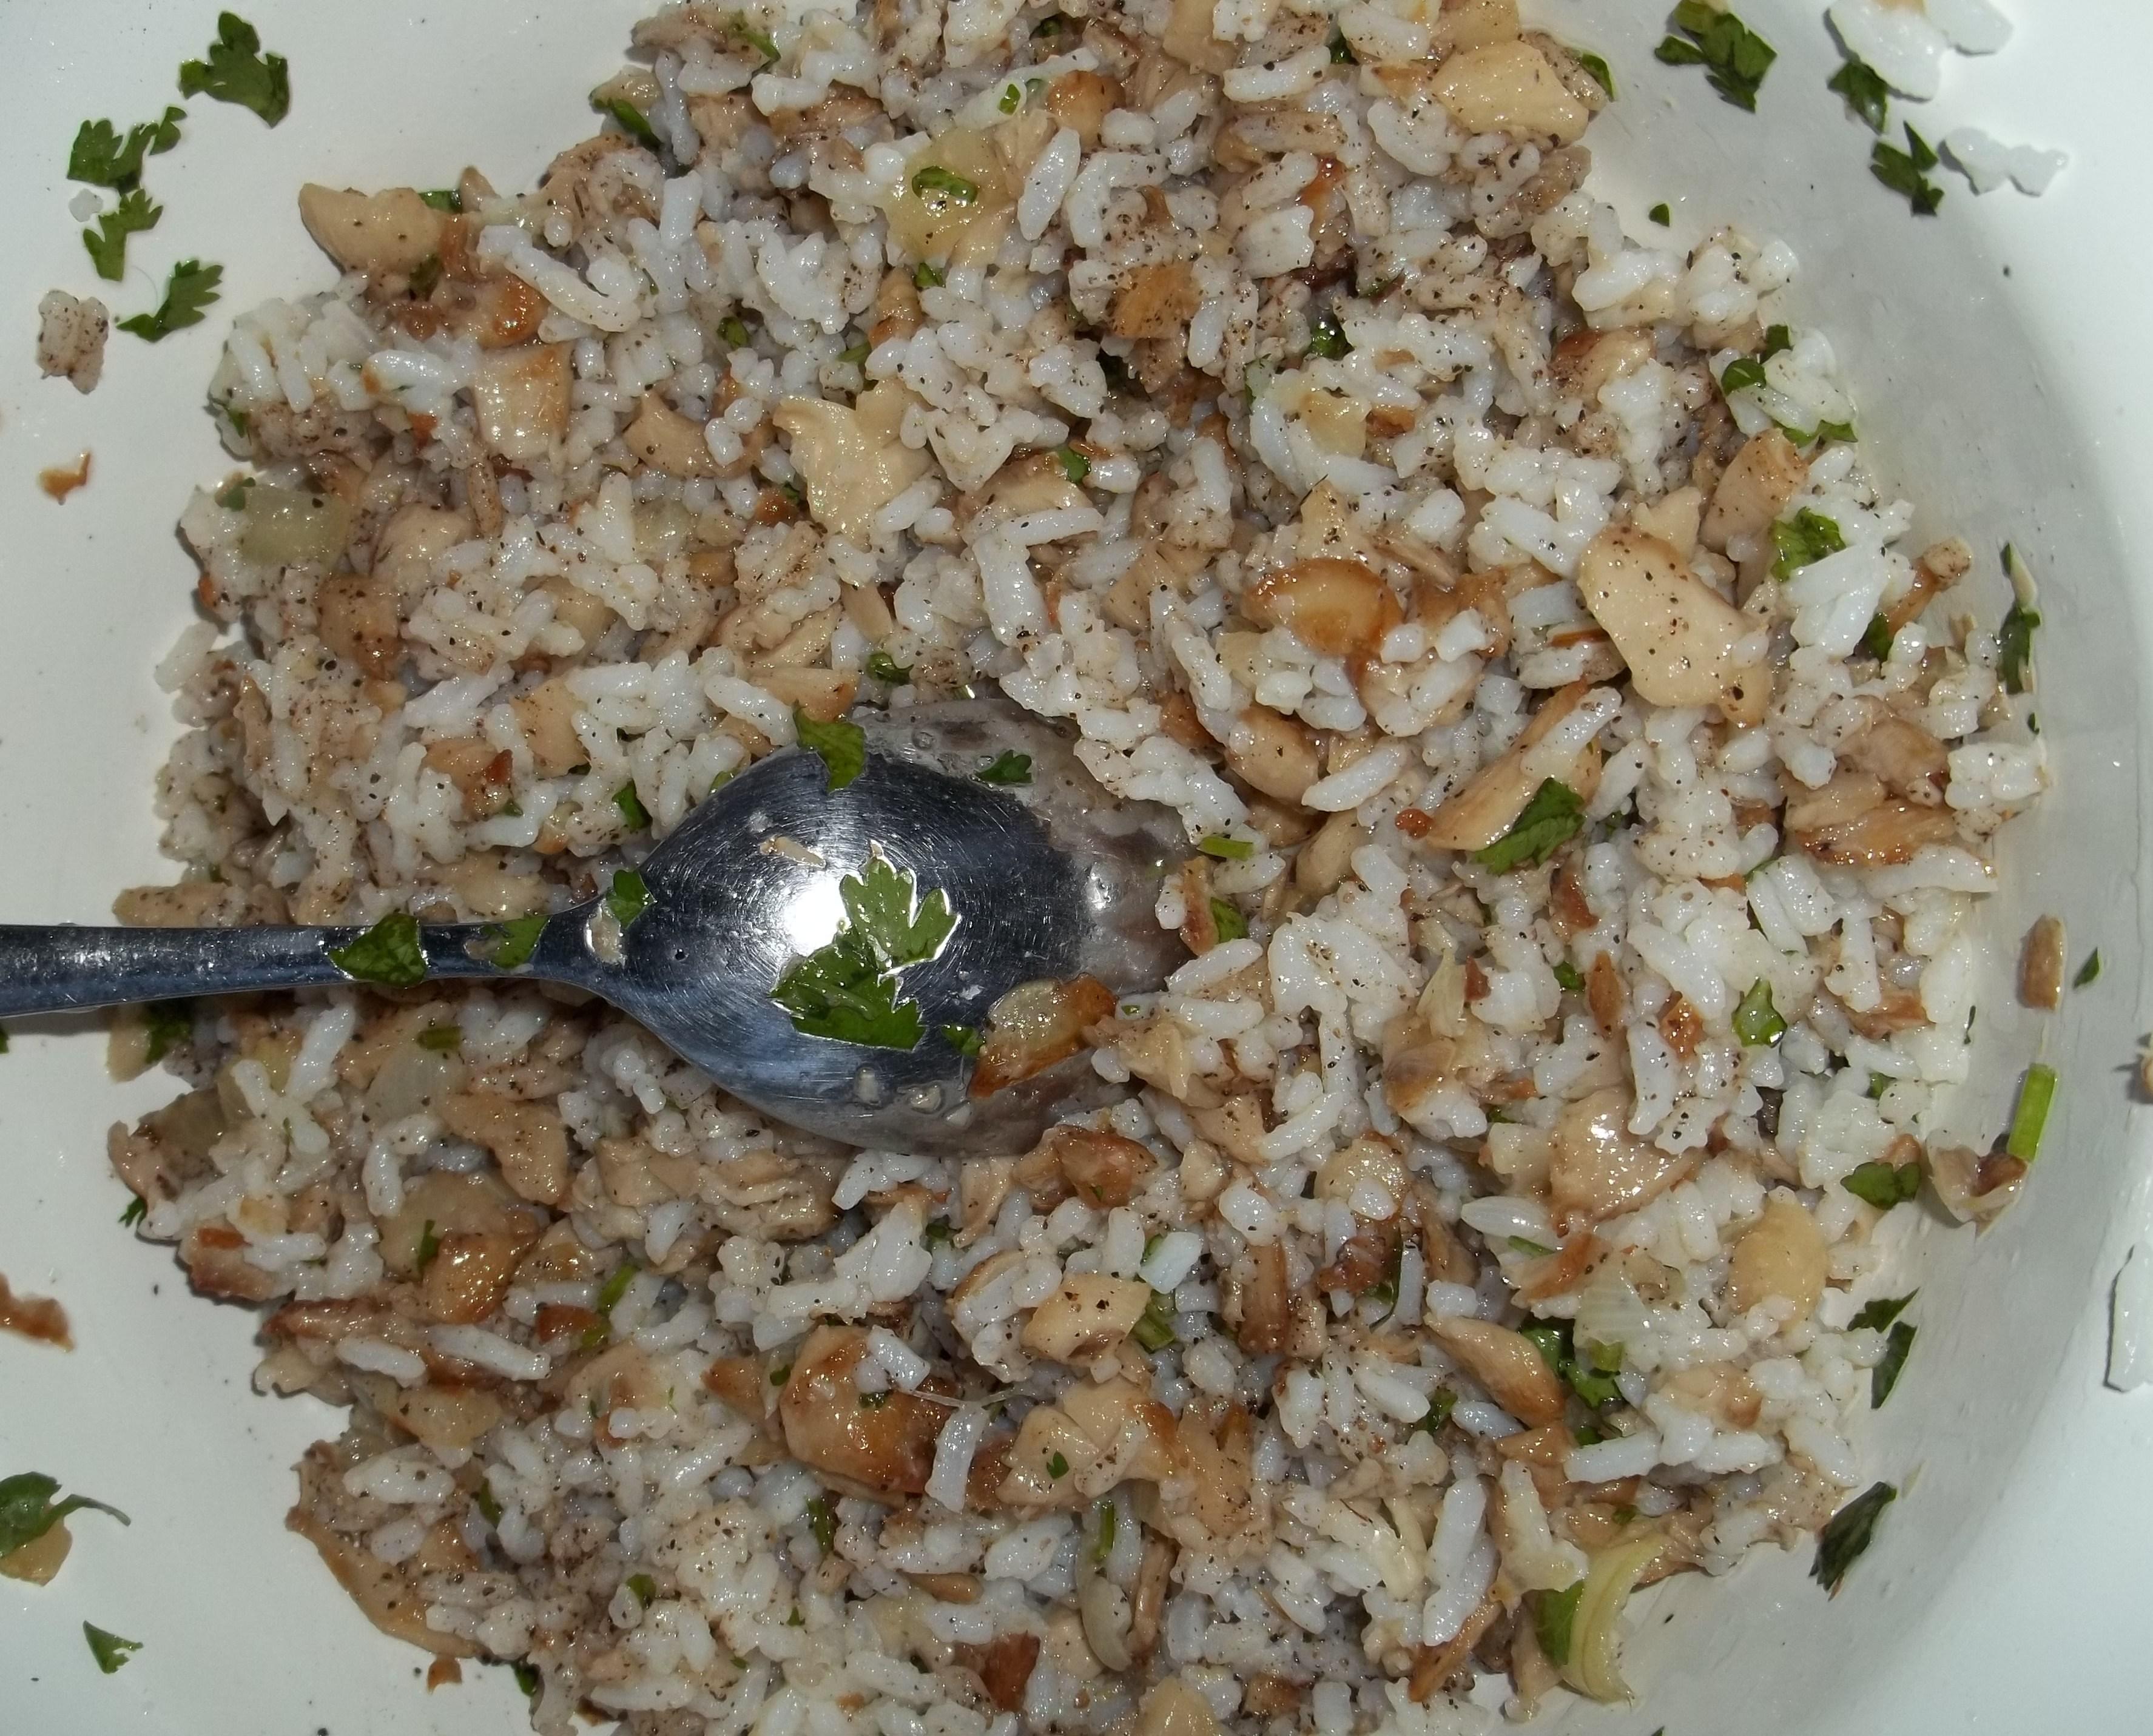 WILD OYSTER MUSHROOM PASTRY | Georgian Recipes